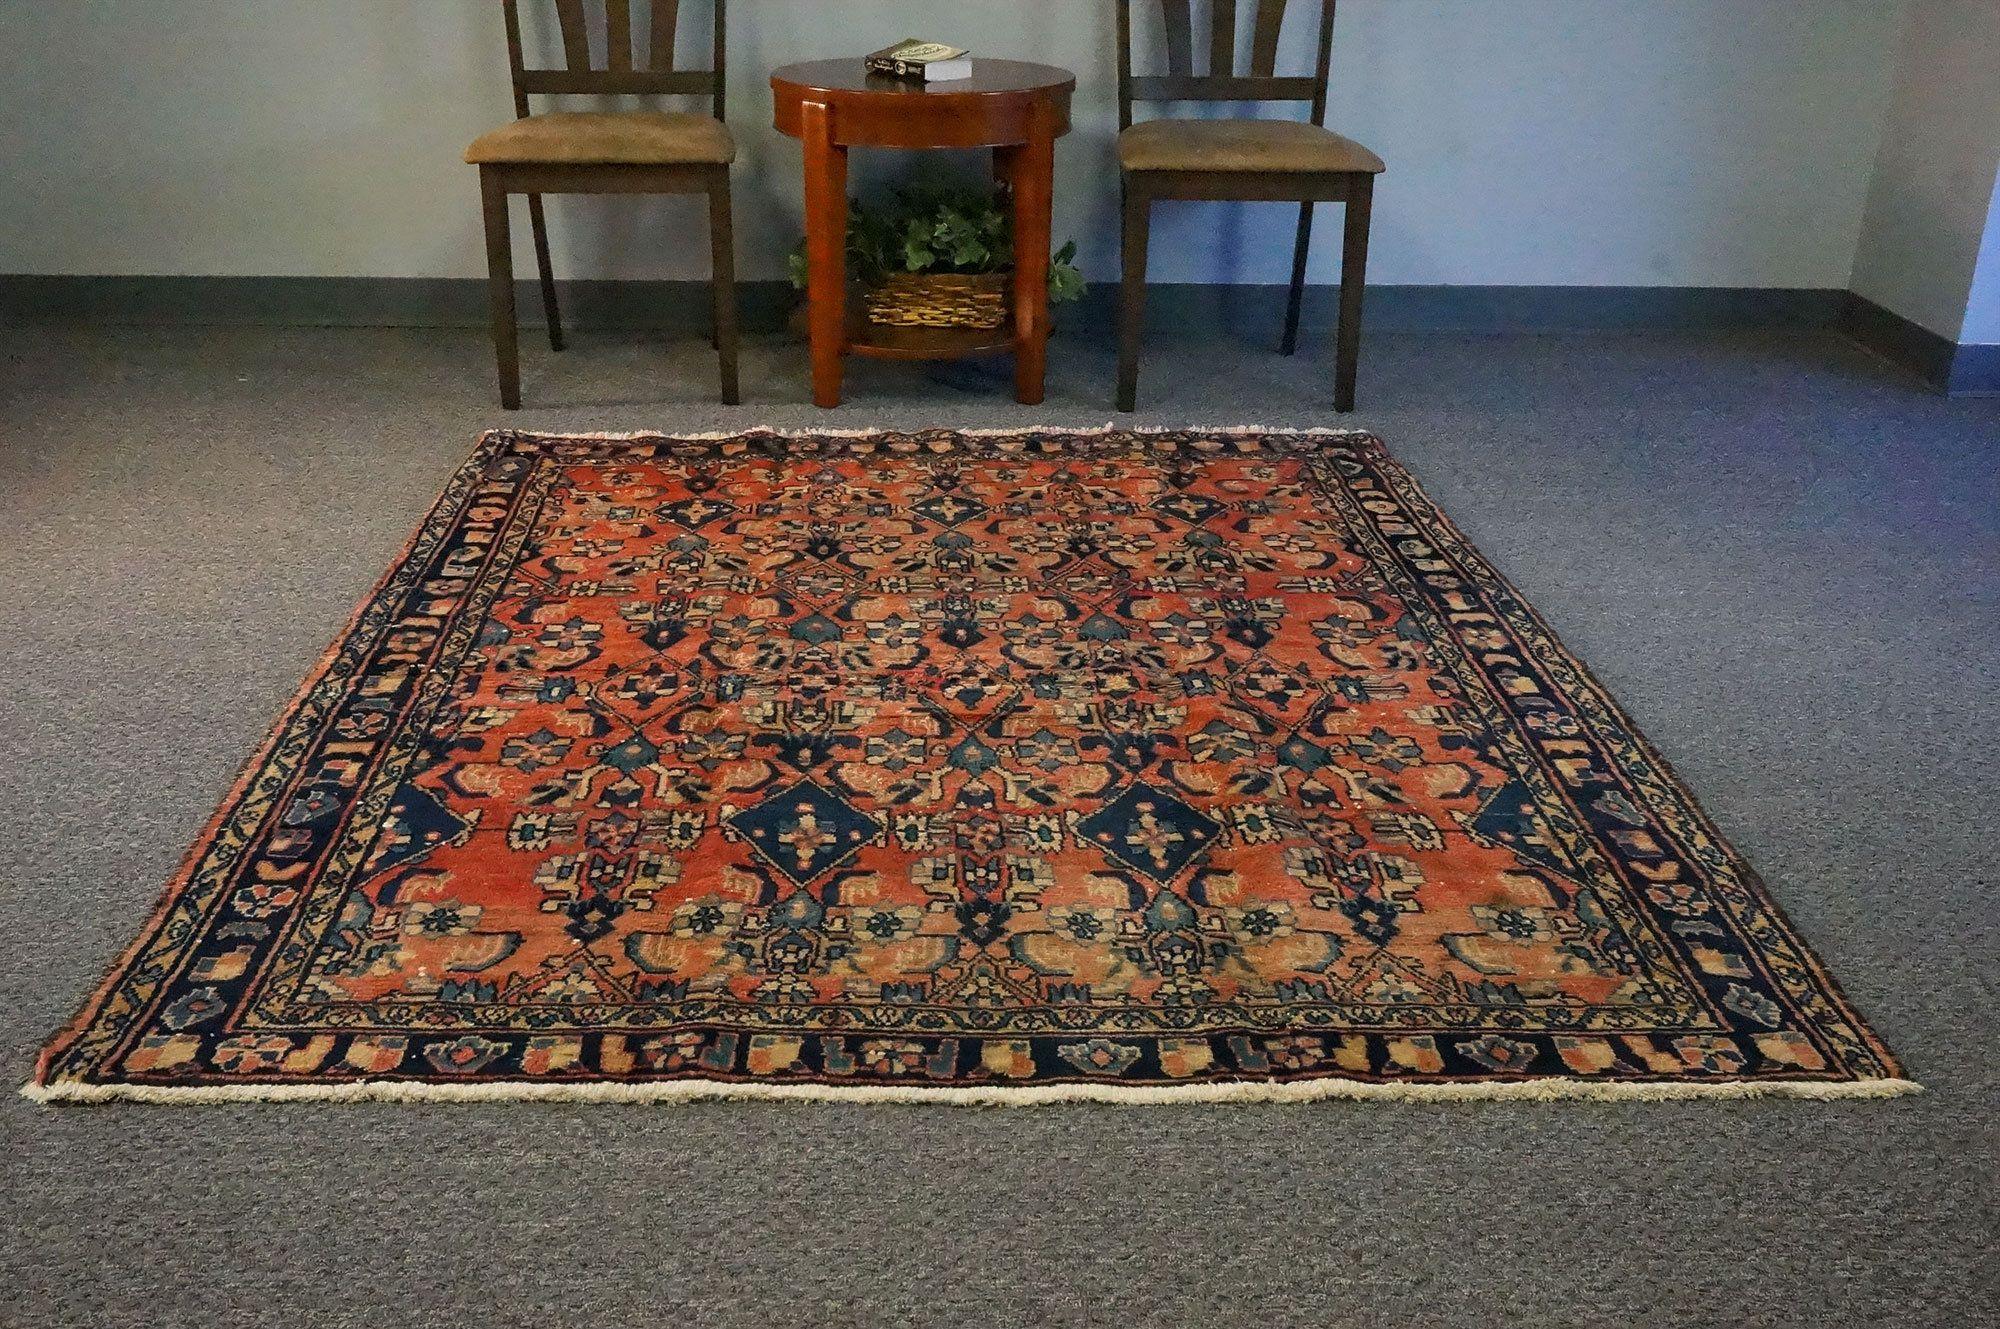 Tribal Geometric Area Rug Bedroom Pale Rug 5x6 Oriental Turkish Rug Vintage Orange And Blue Oushak Carpet 5 2 X5 11 Carpets Sku 1728 Goruntuler Ile